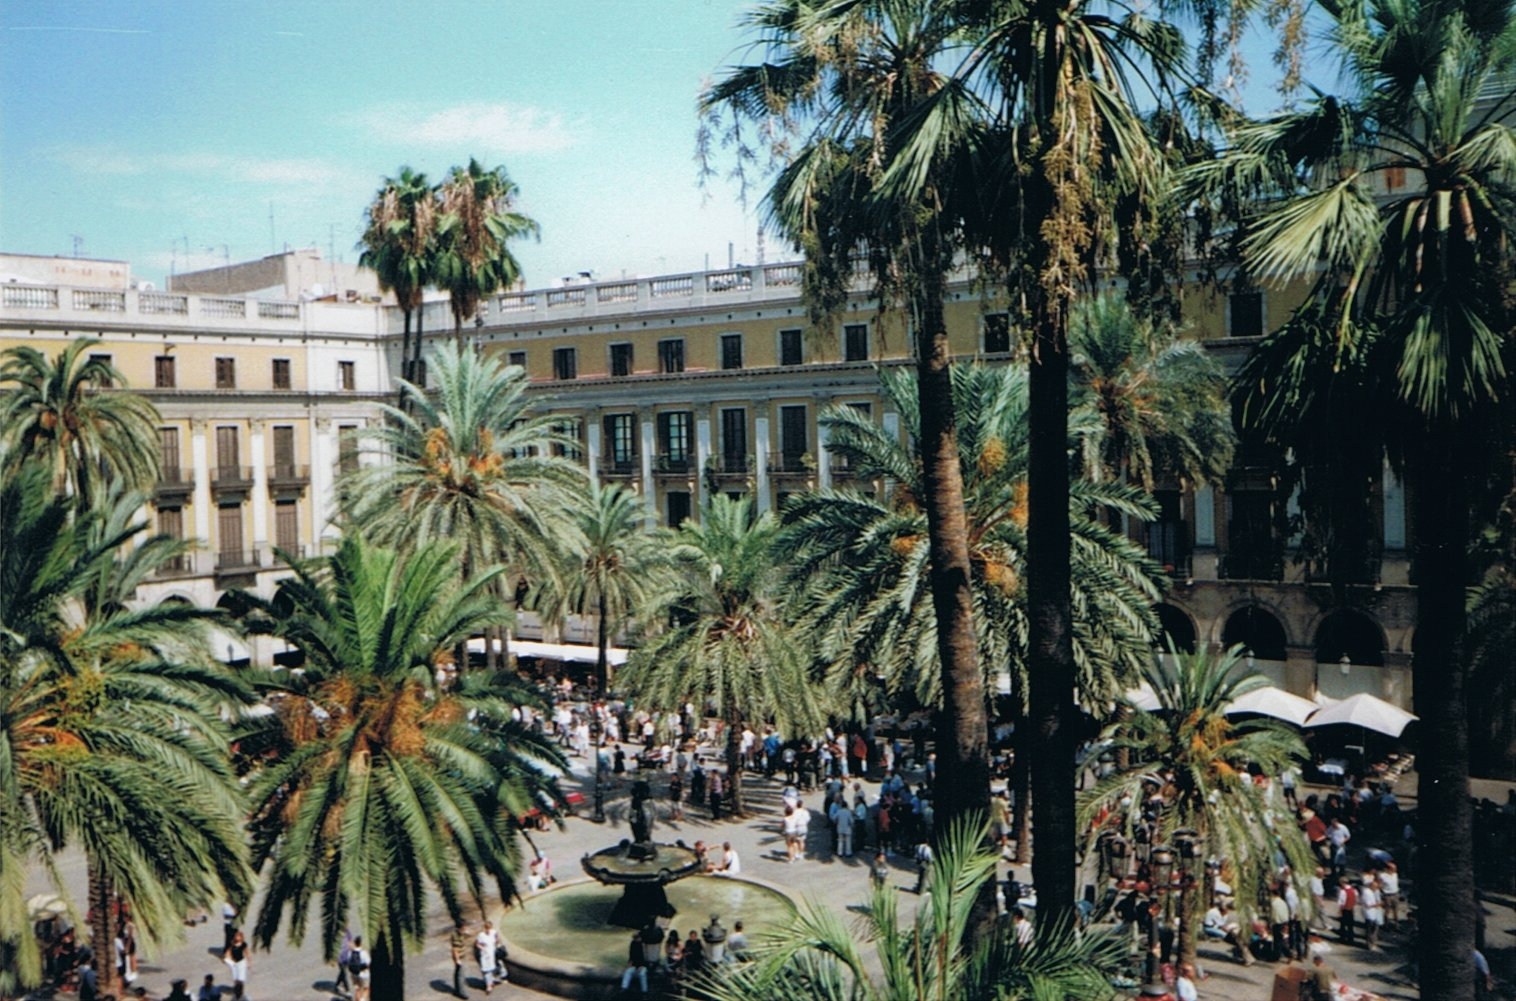 spanien costa brava barcelona sehensw rdigkeiten plaza reial. Black Bedroom Furniture Sets. Home Design Ideas